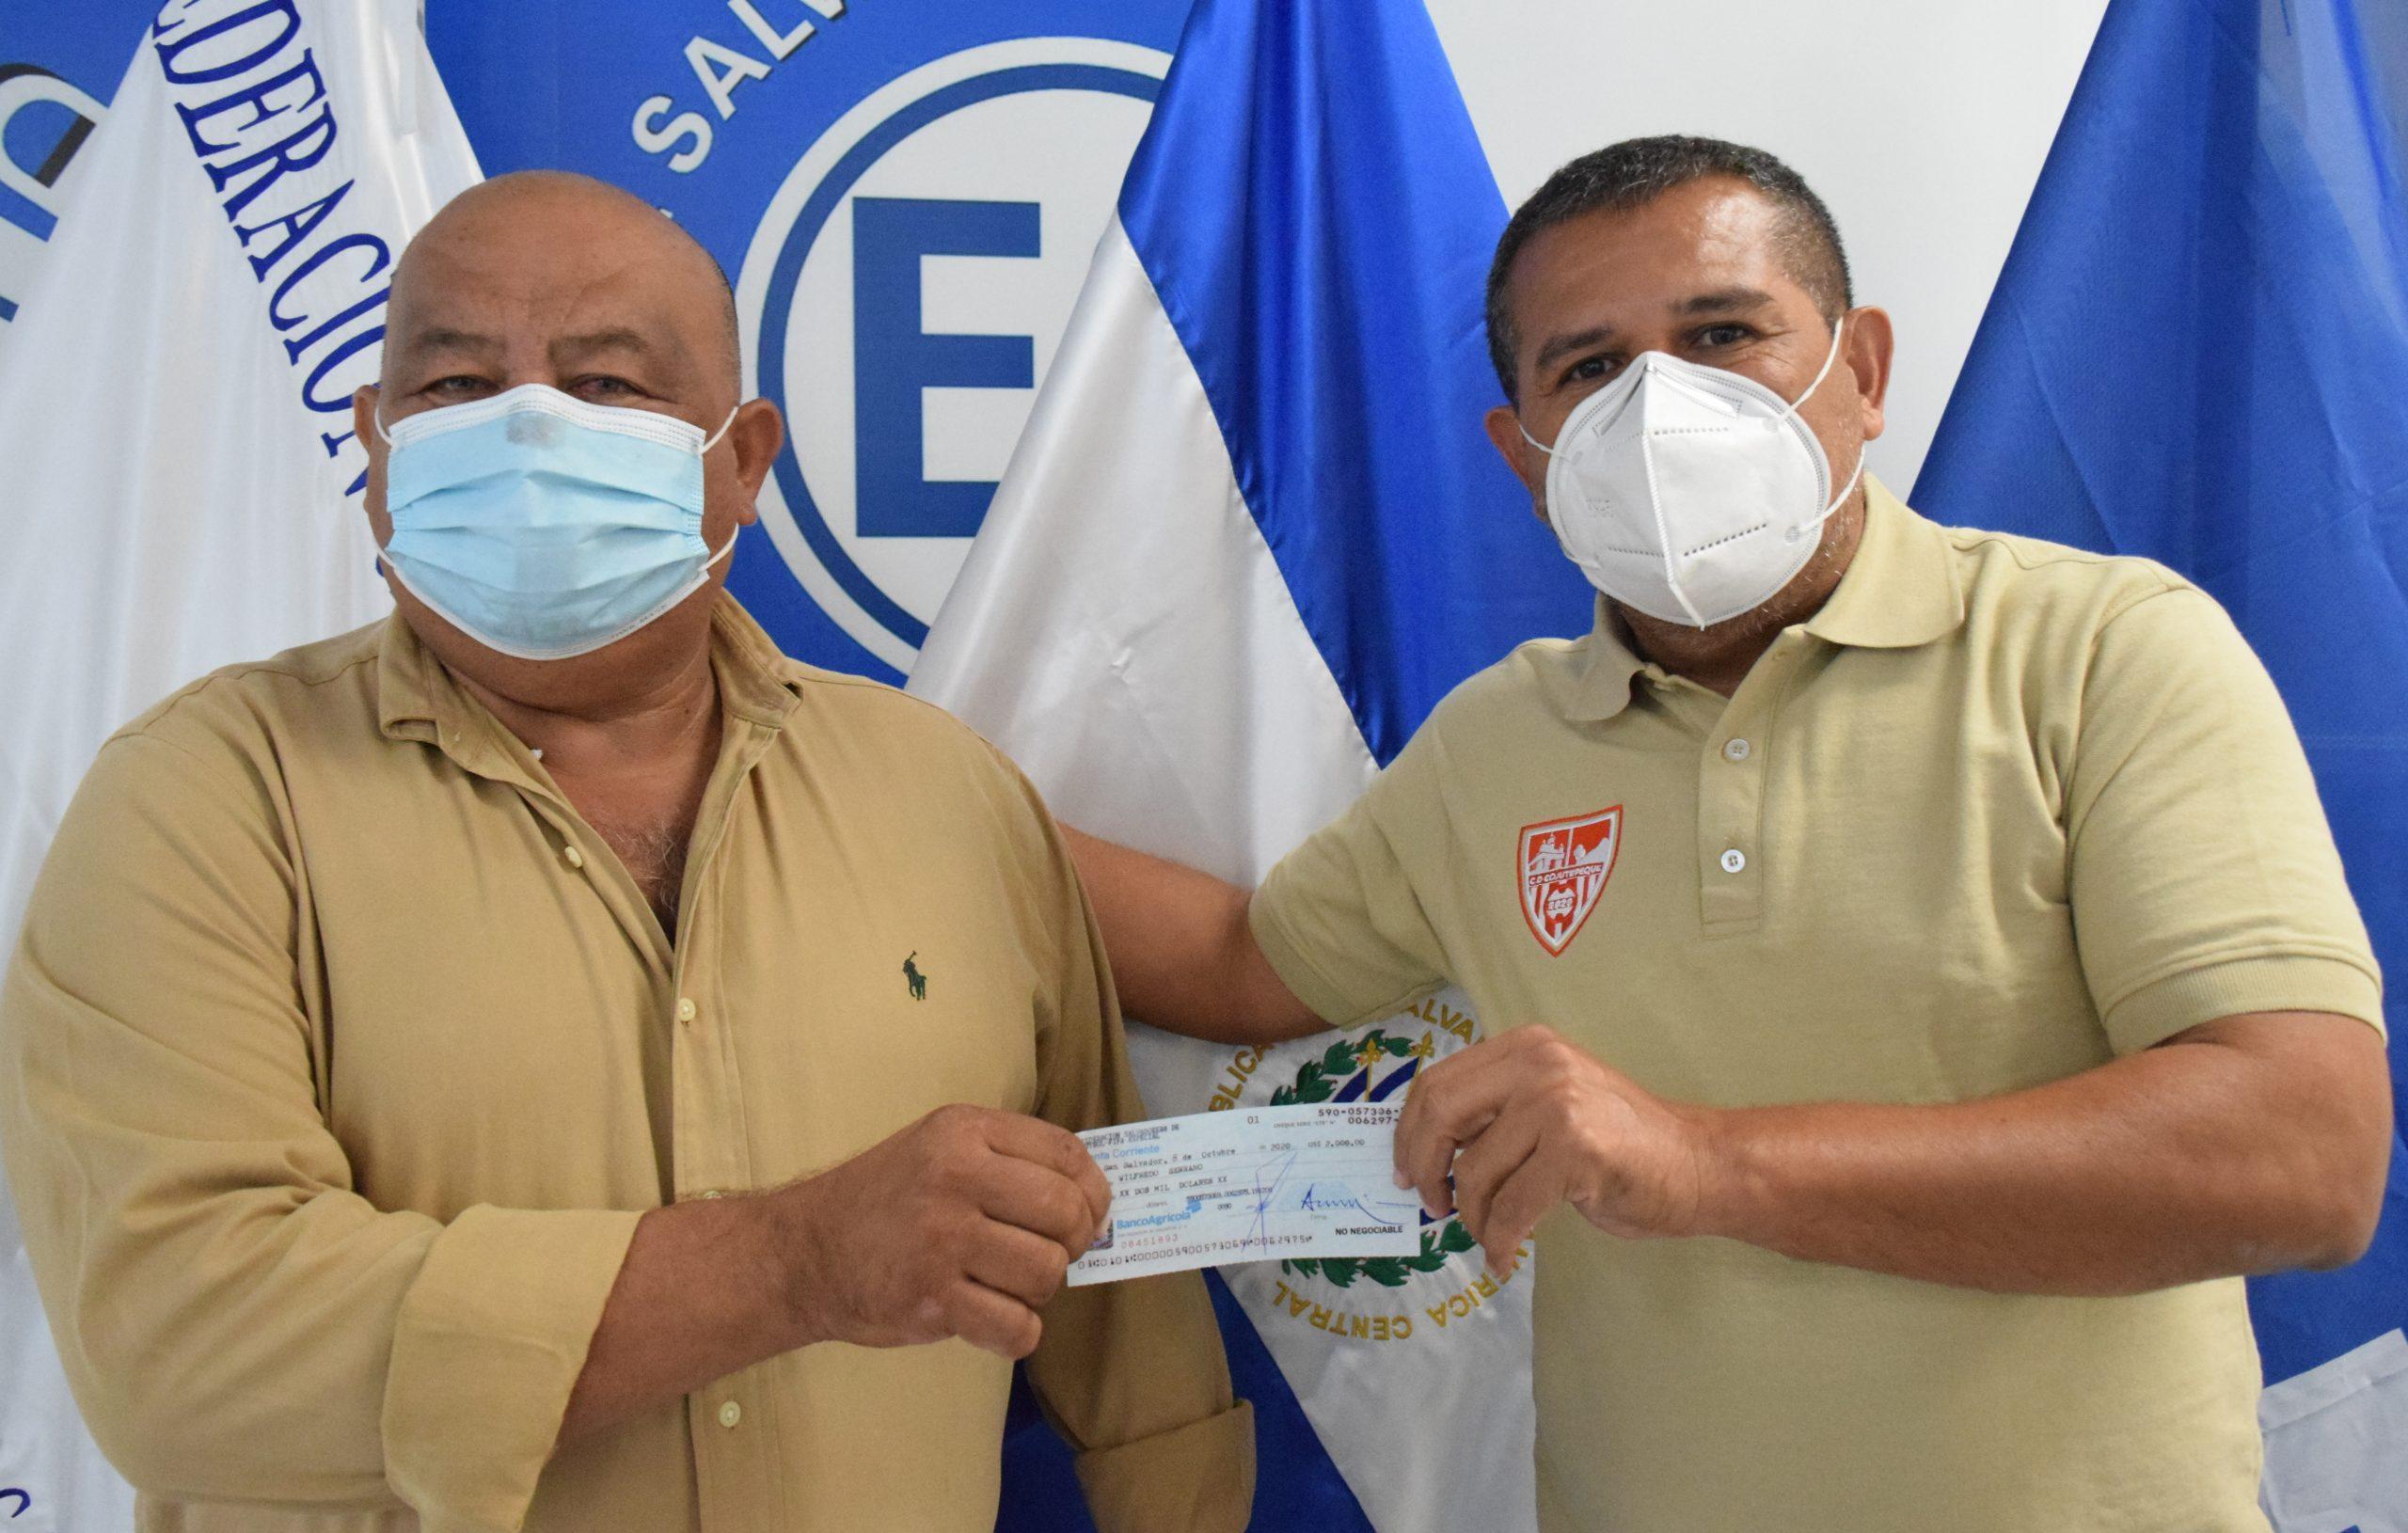 Señor Wilfredo Serrano de Asociación Deportiva Juventud Cara Sucia, Ahuachapán